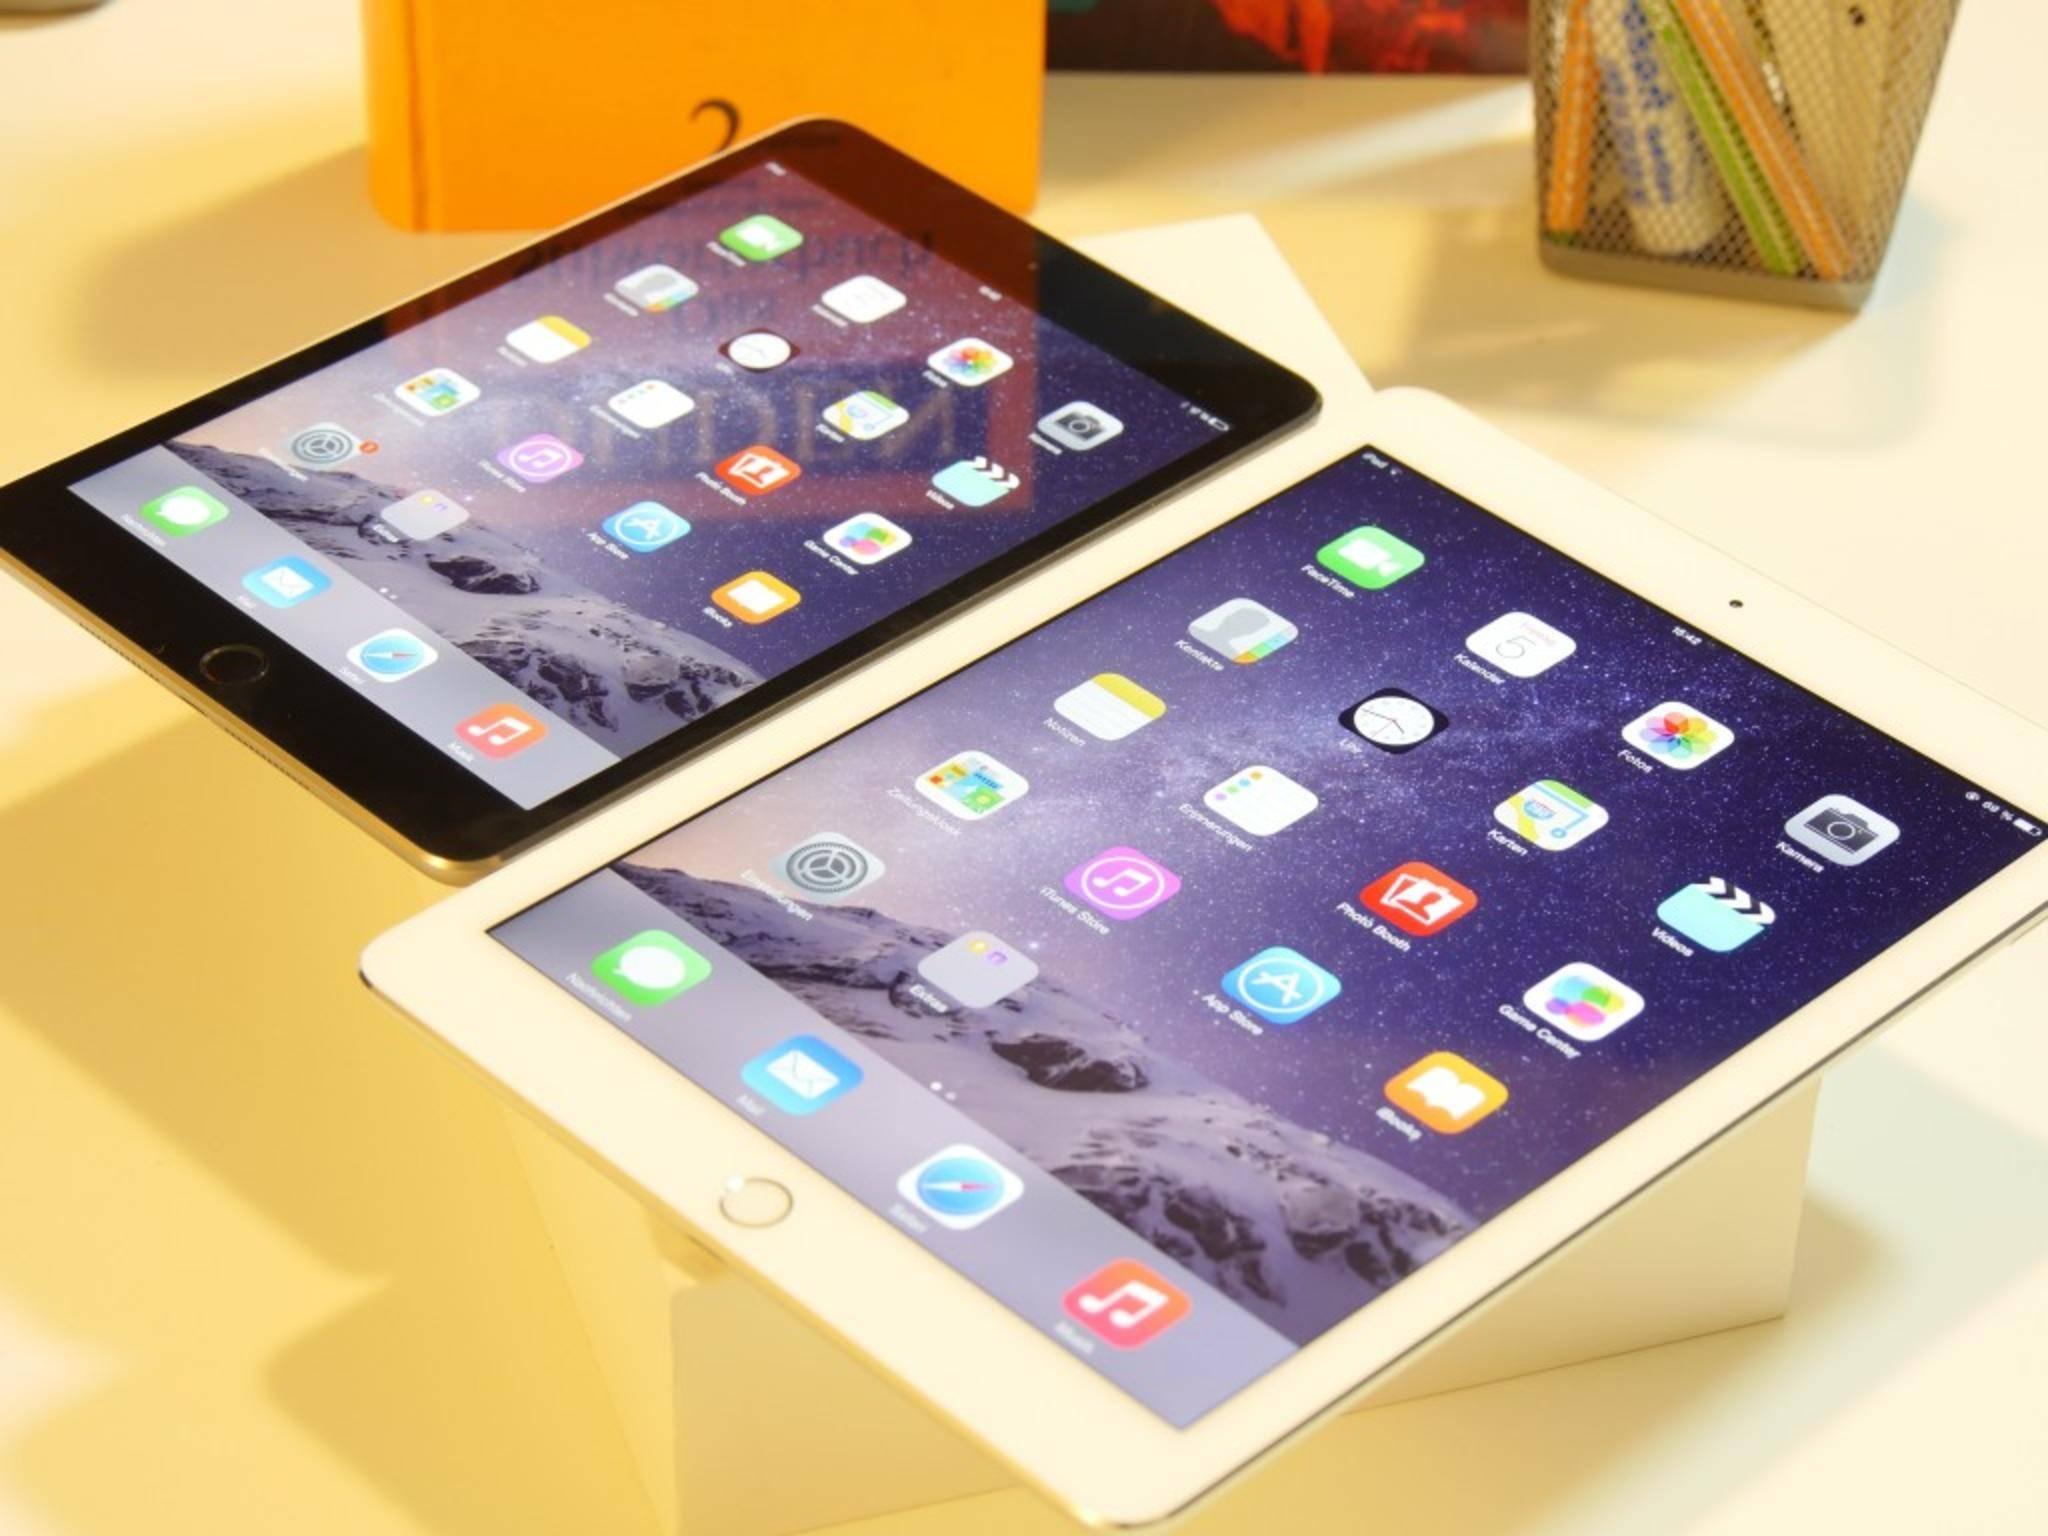 Das iPad mini 4 könnte die Specs des iPad Air 2 haben.